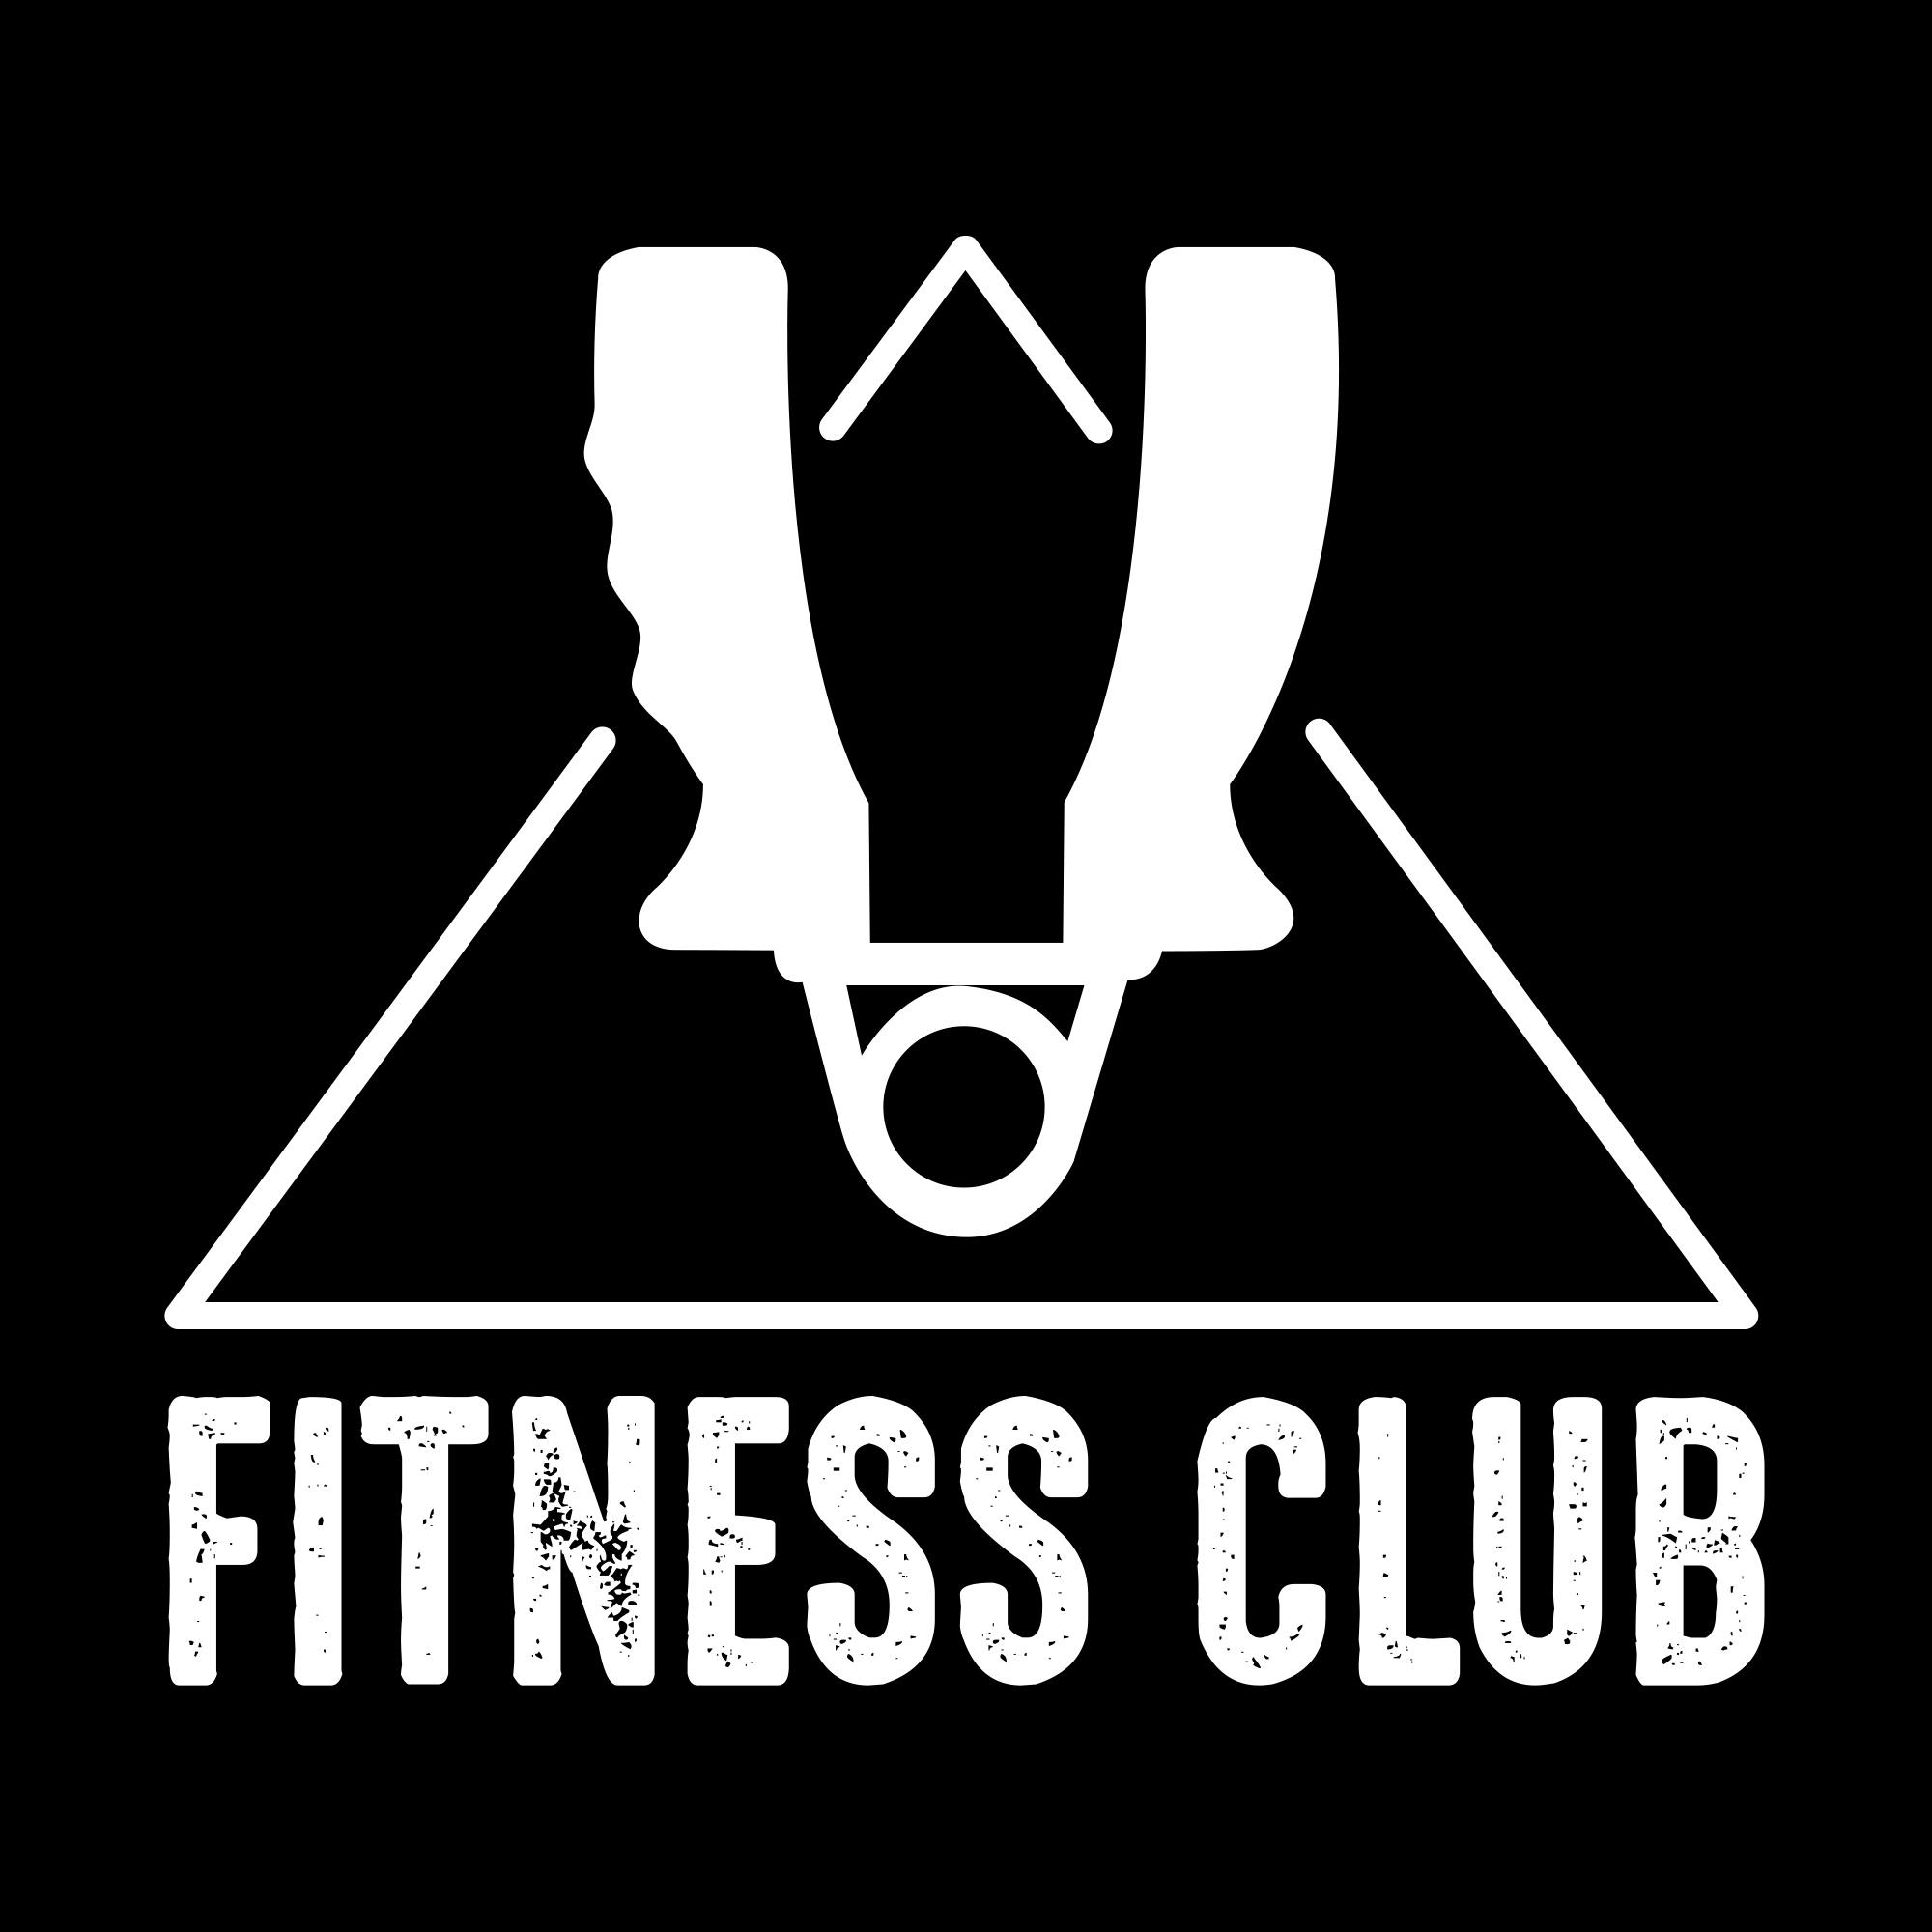 Fitness Logos: Fitness Vintage Badge & Logo - fitness05